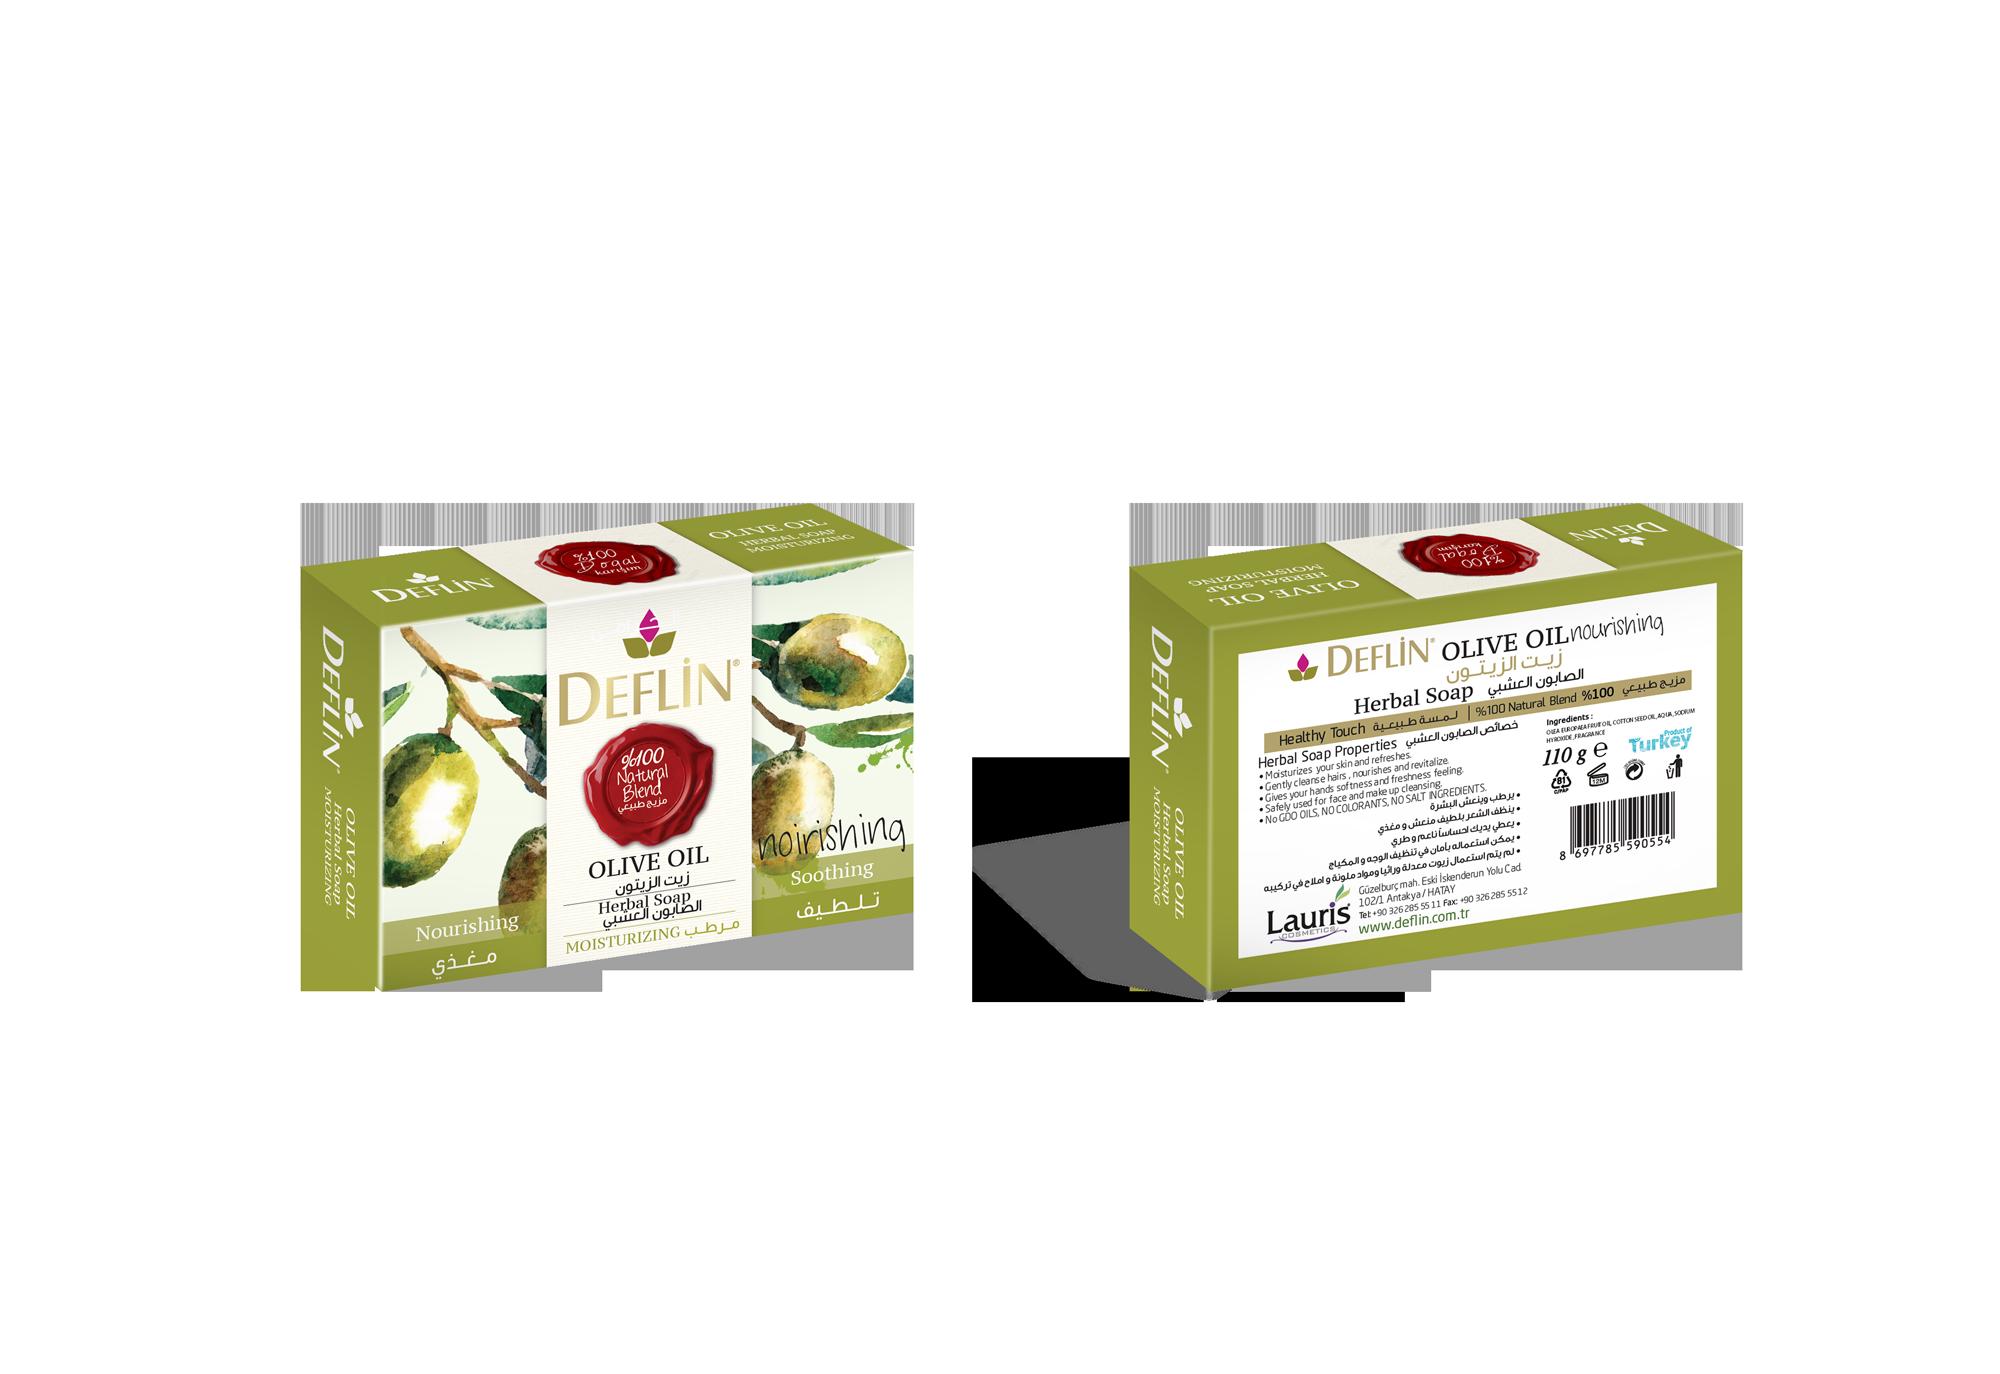 Deflin herbal solid soap OLIVE OIL